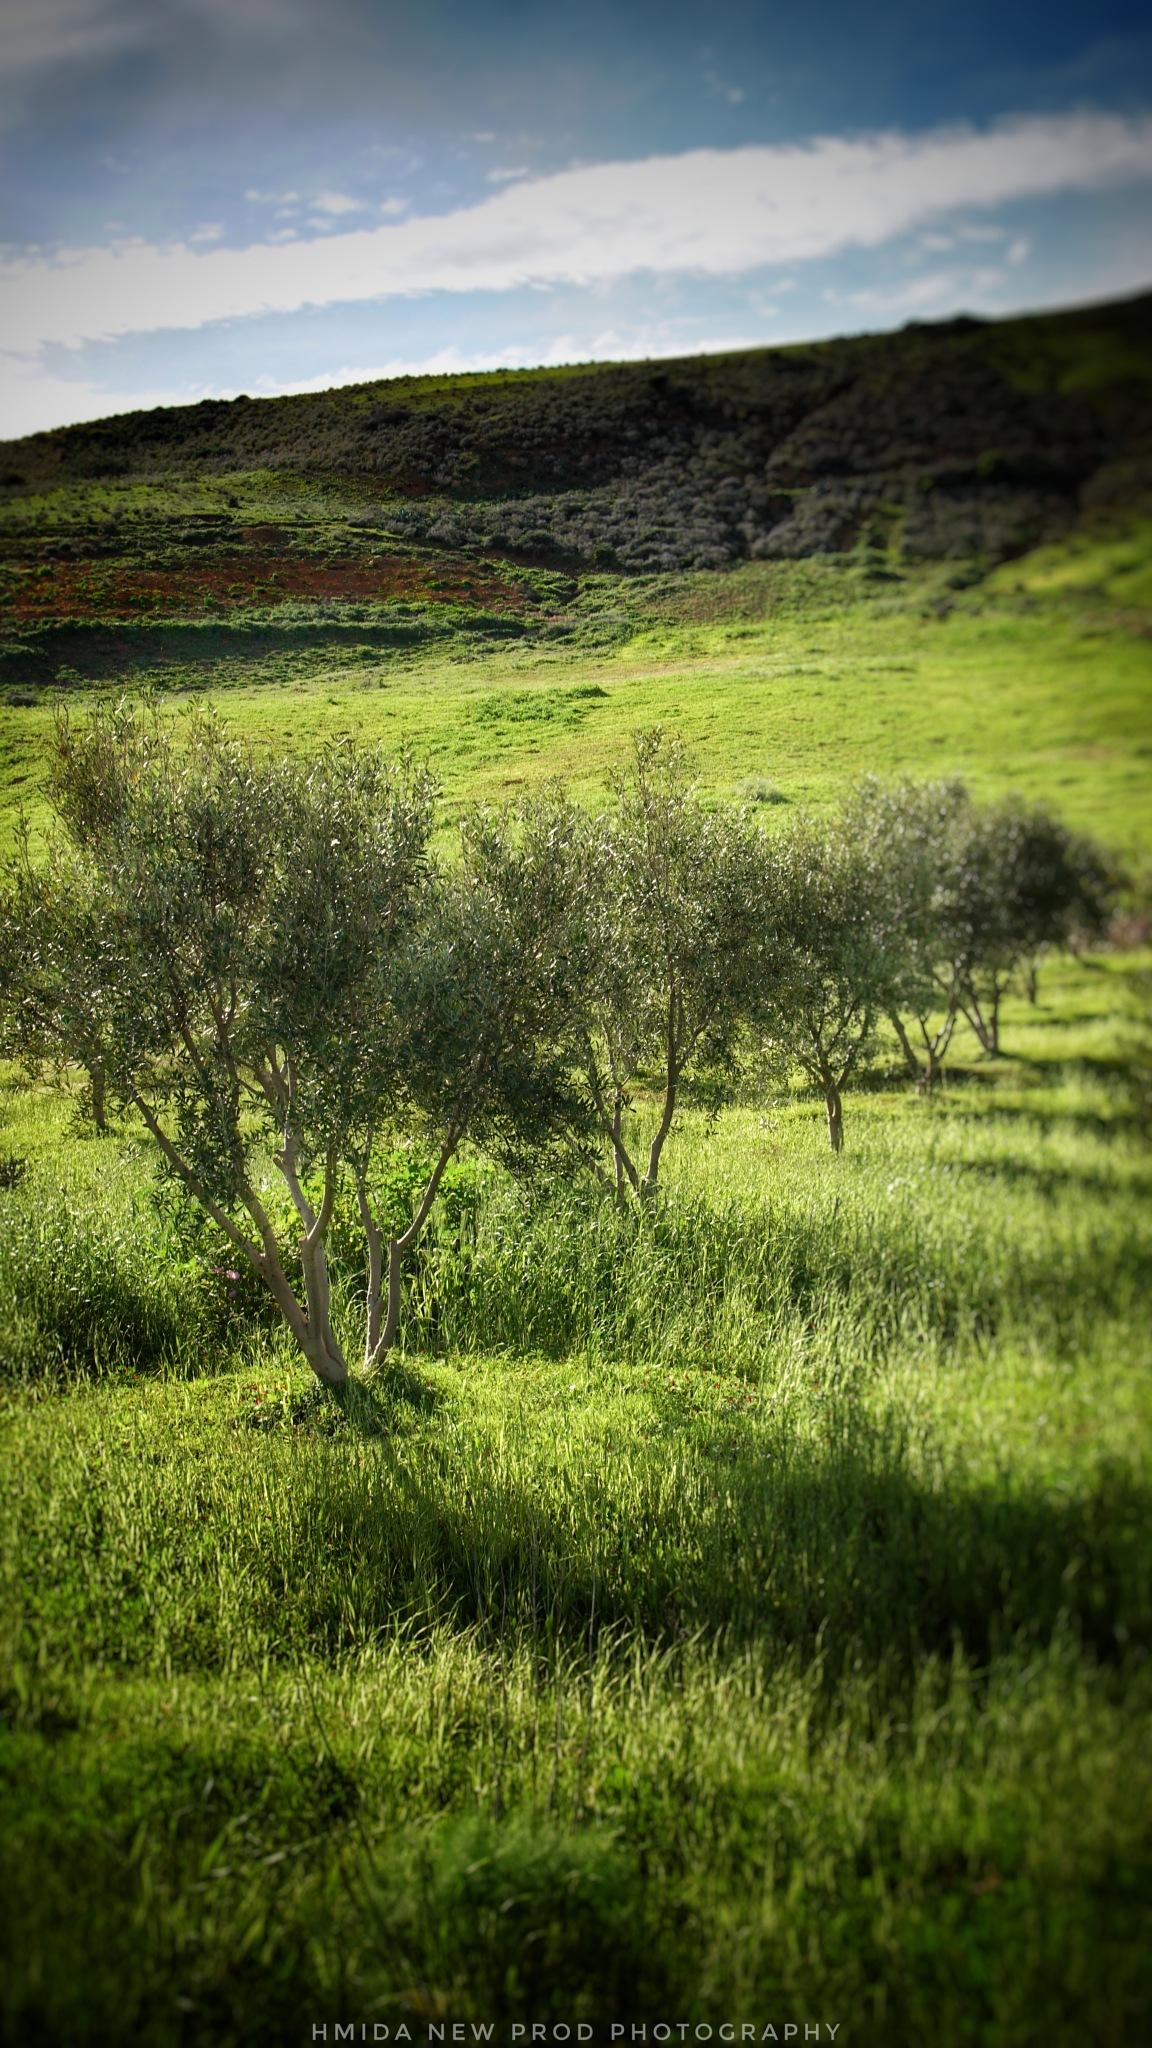 Olive trees by Hmida31